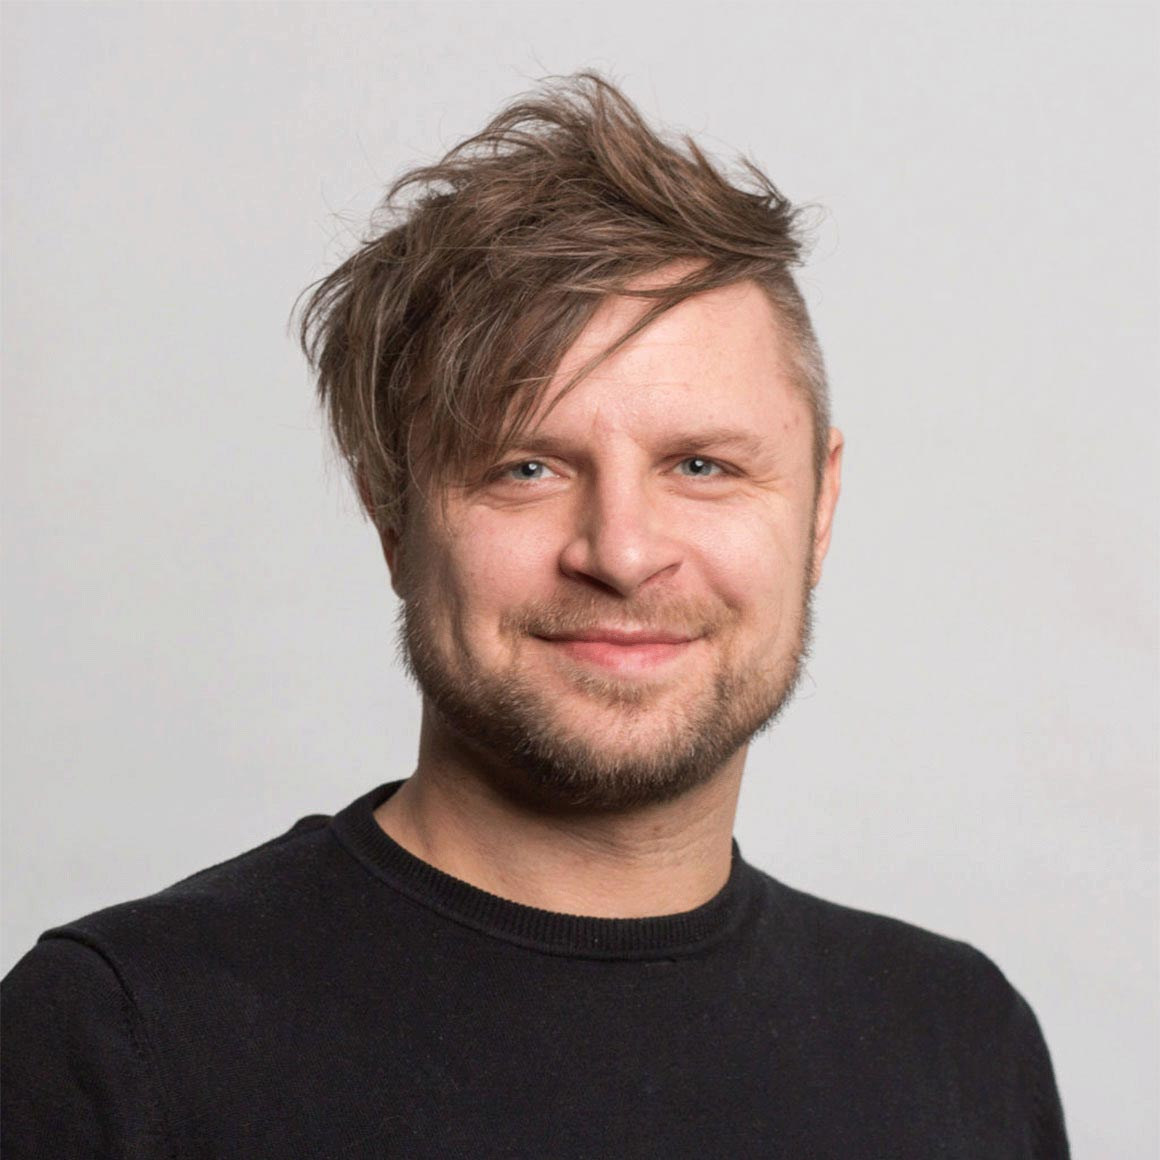 Marco Petri